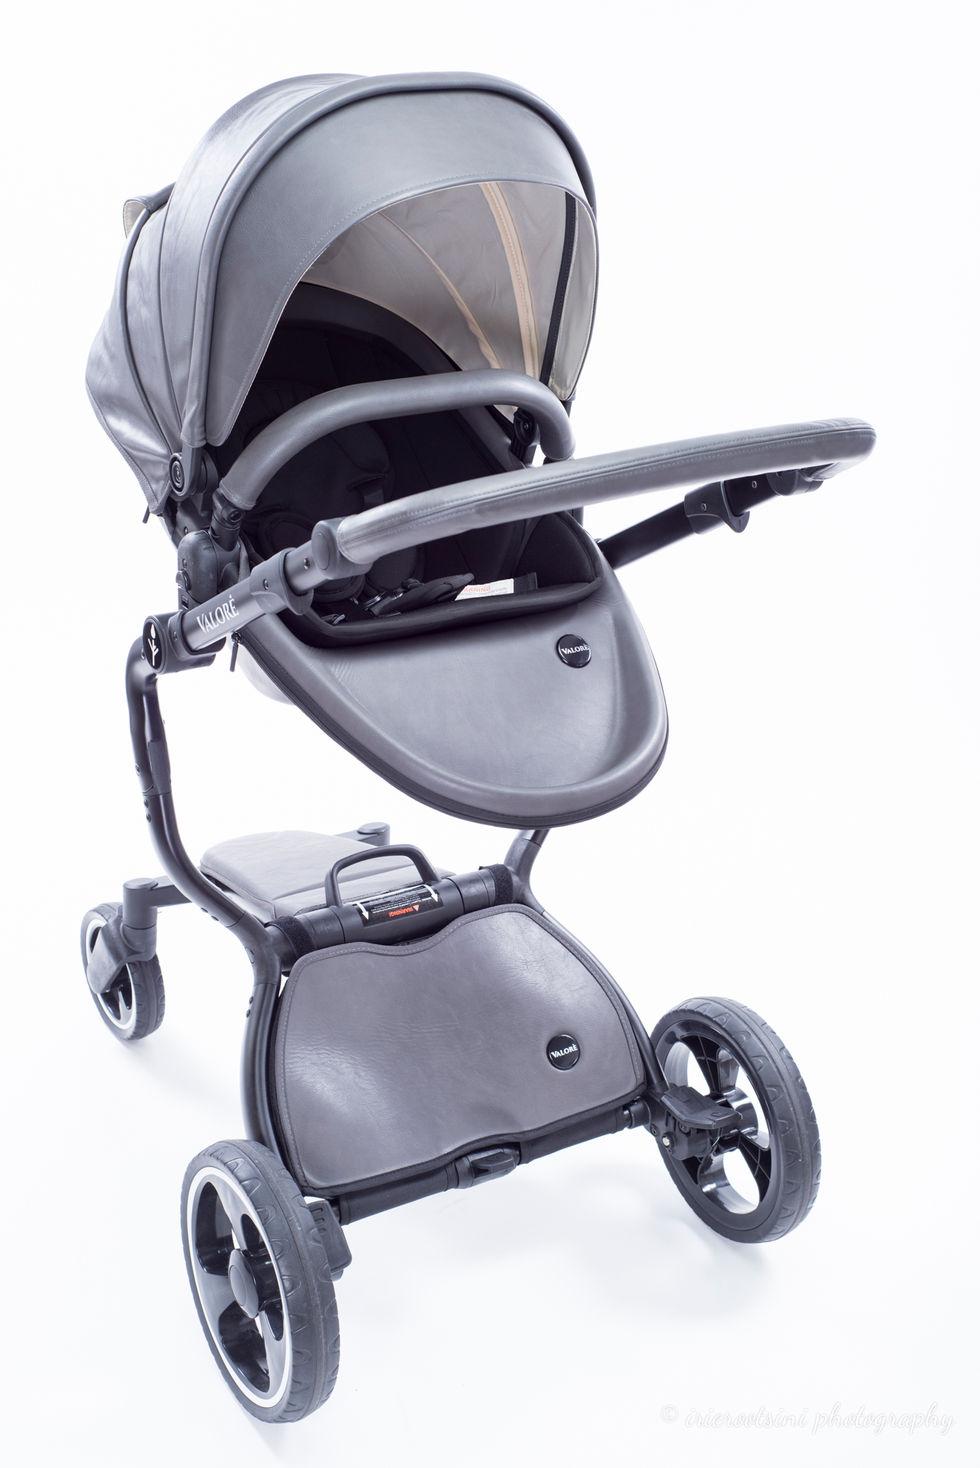 Valore-Strollers-Product-Photographer-Bungarribee-Sydney-4.jpg